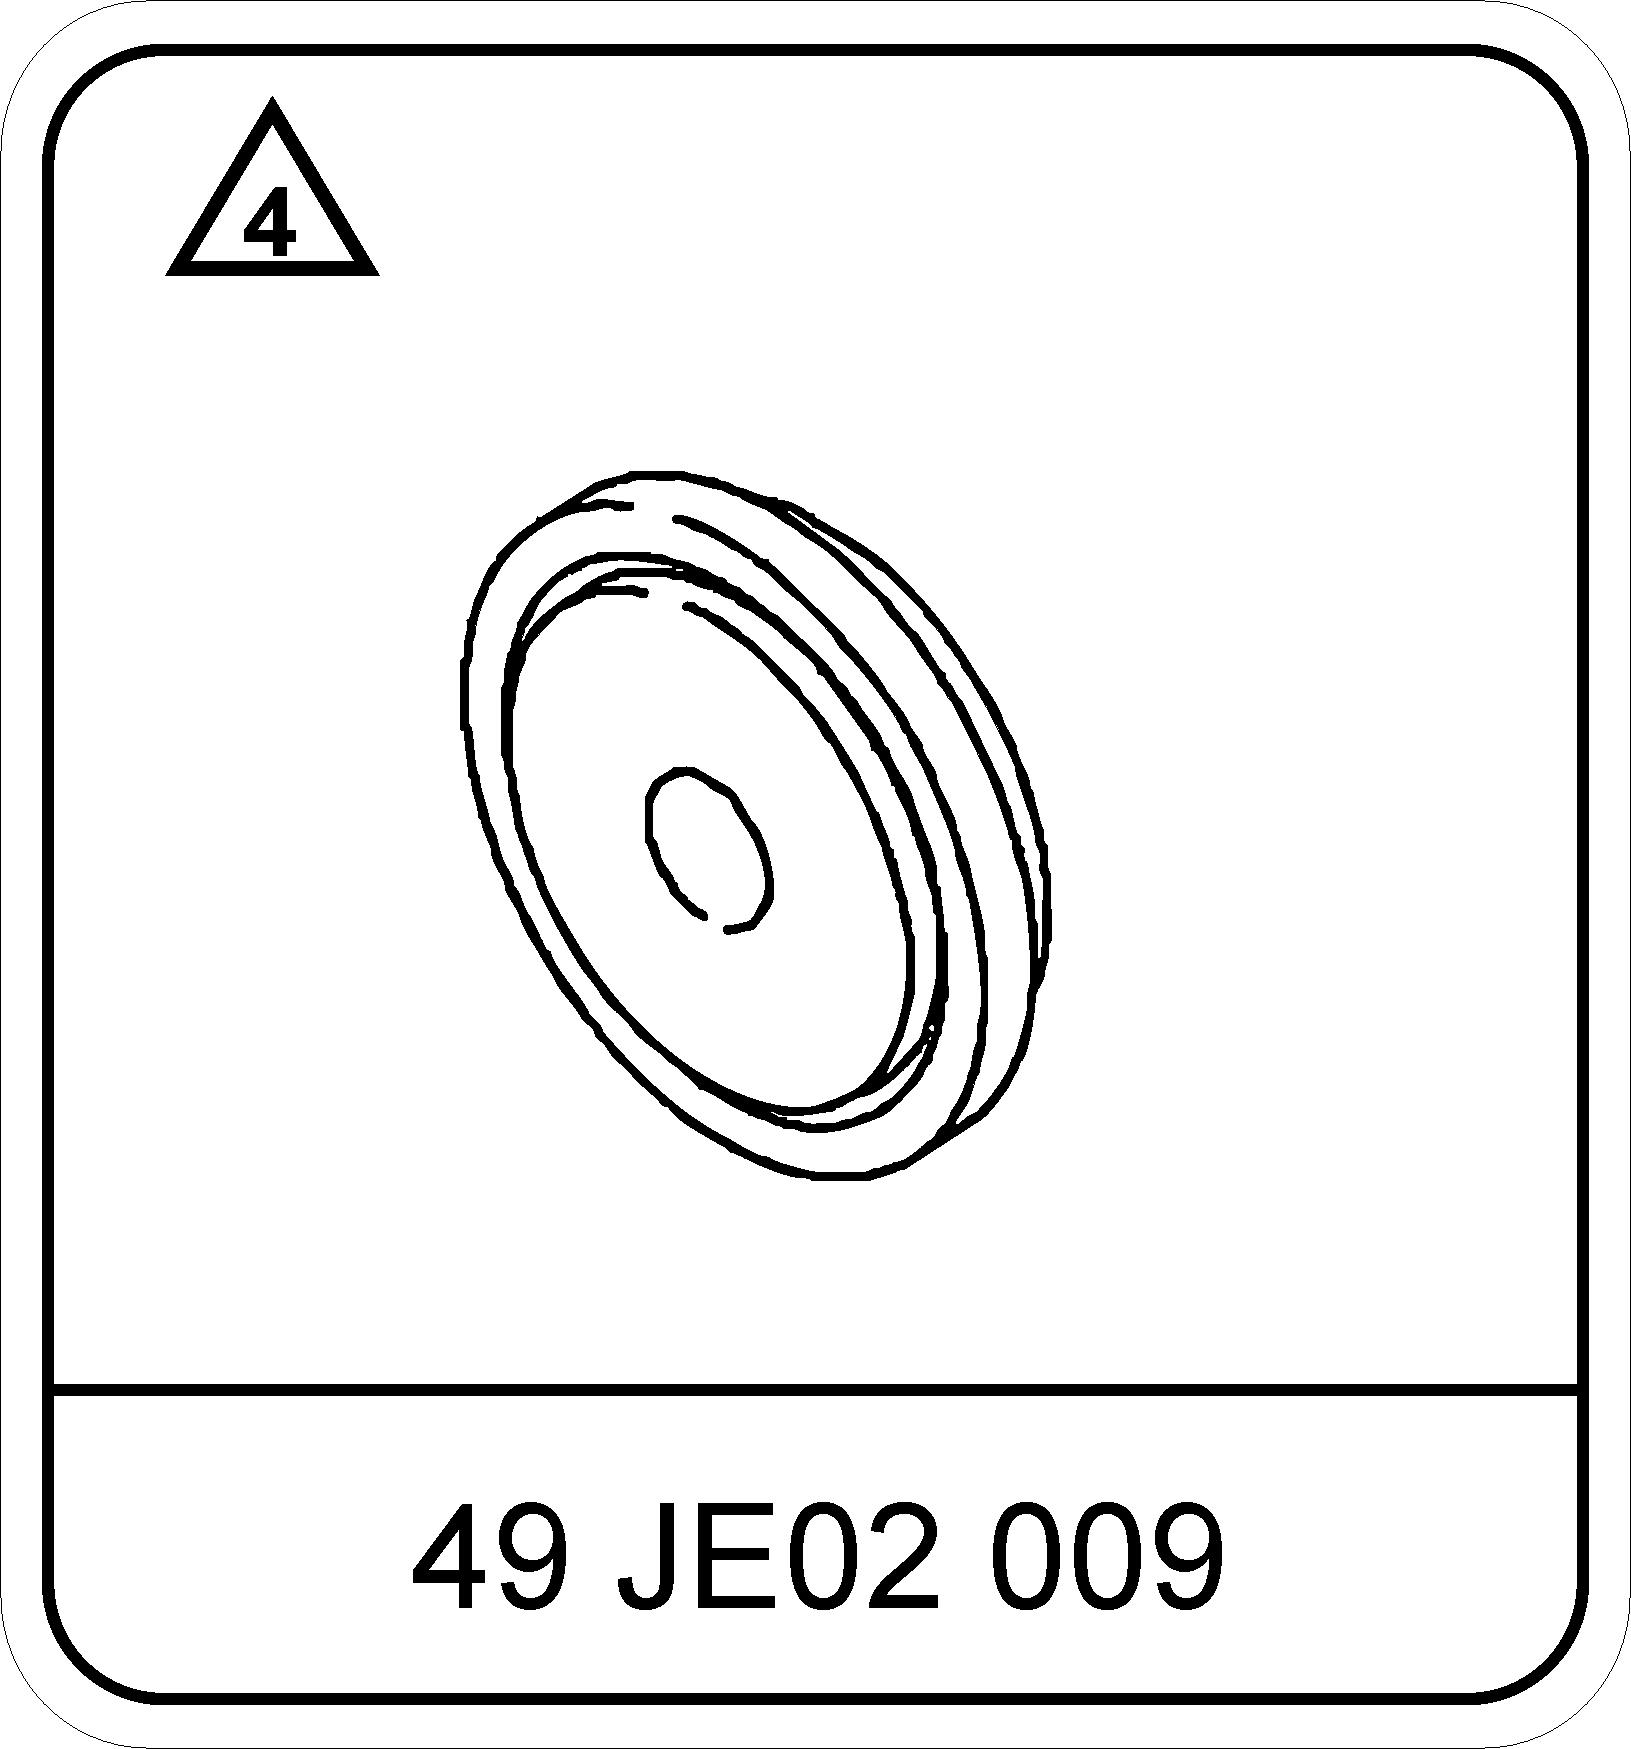 49-je02-009.png